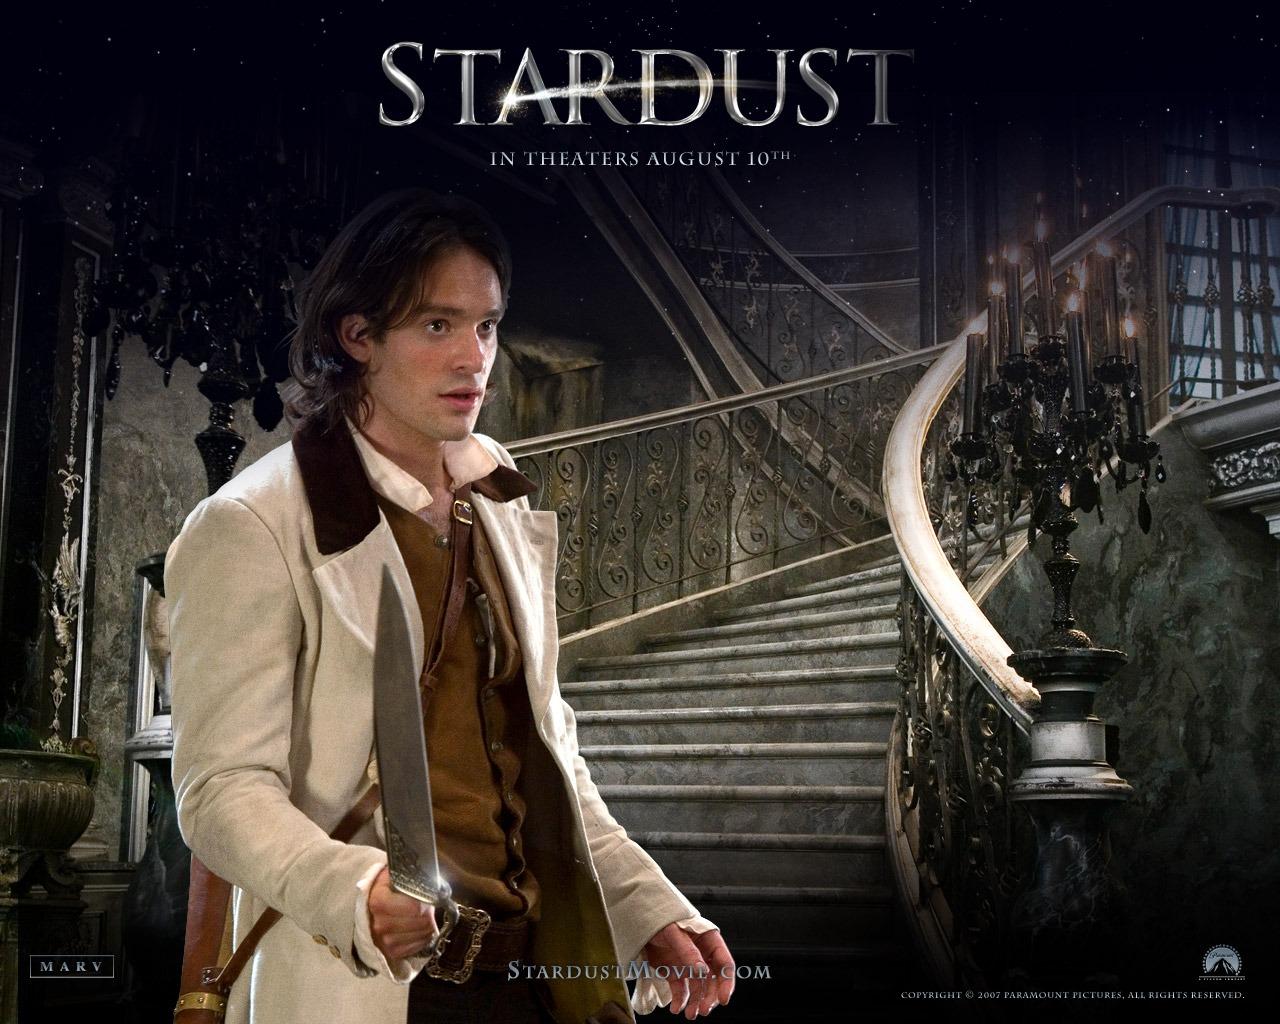 Stardust Primus Wallpaper Stardust Movies Wallpapers in jpg format